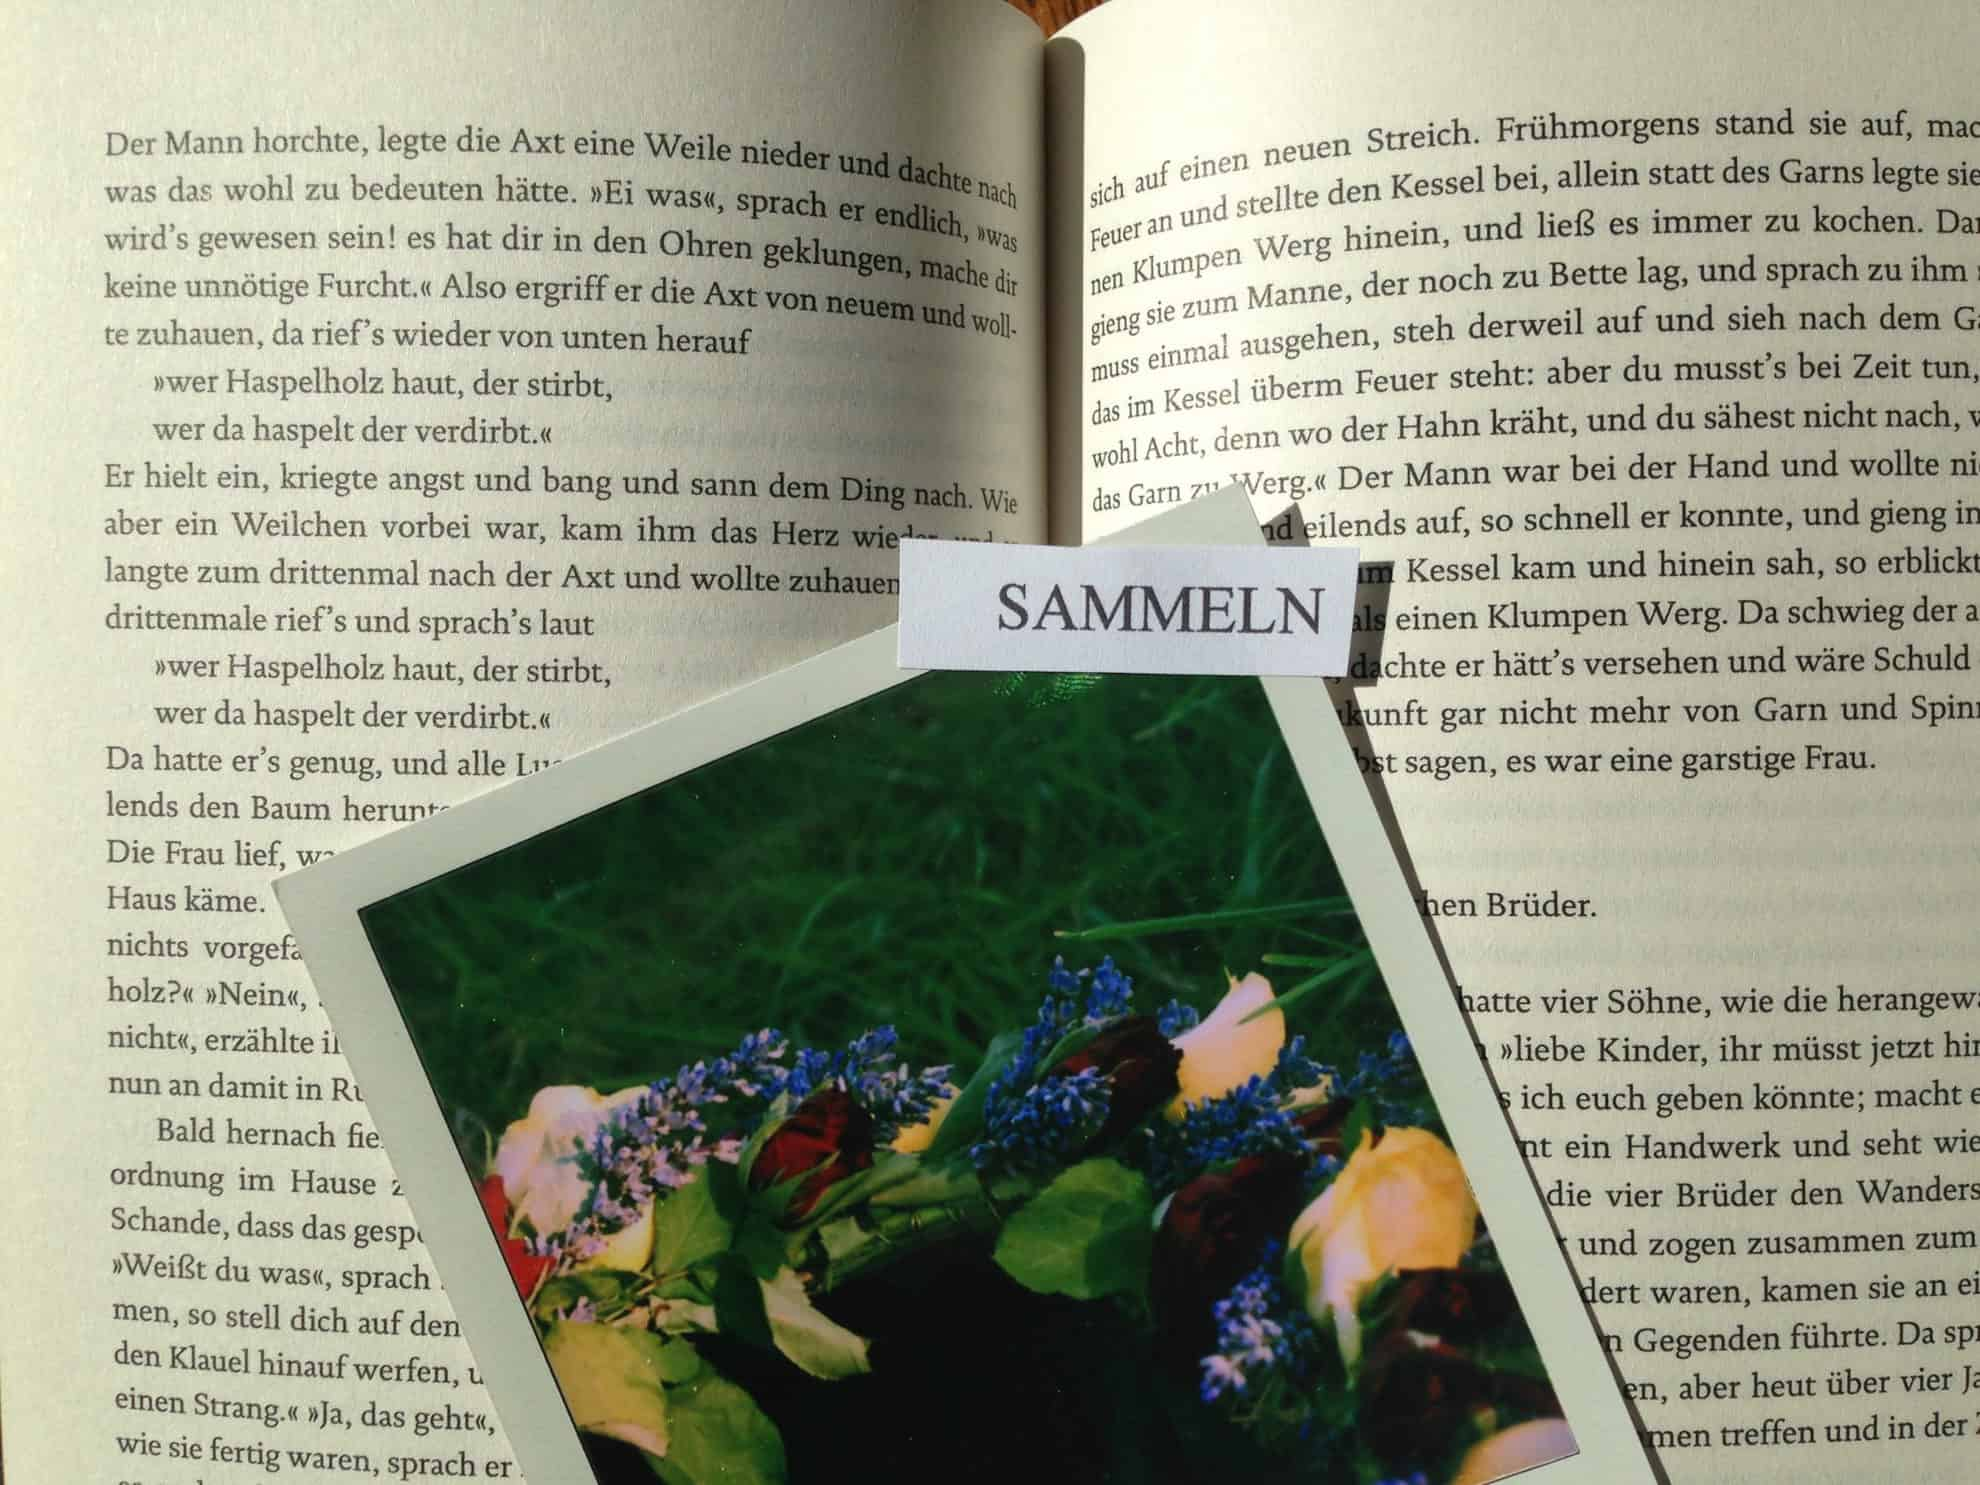 IMG 2588 scaled - Kapitel 0: Die Kunst des Sammelns